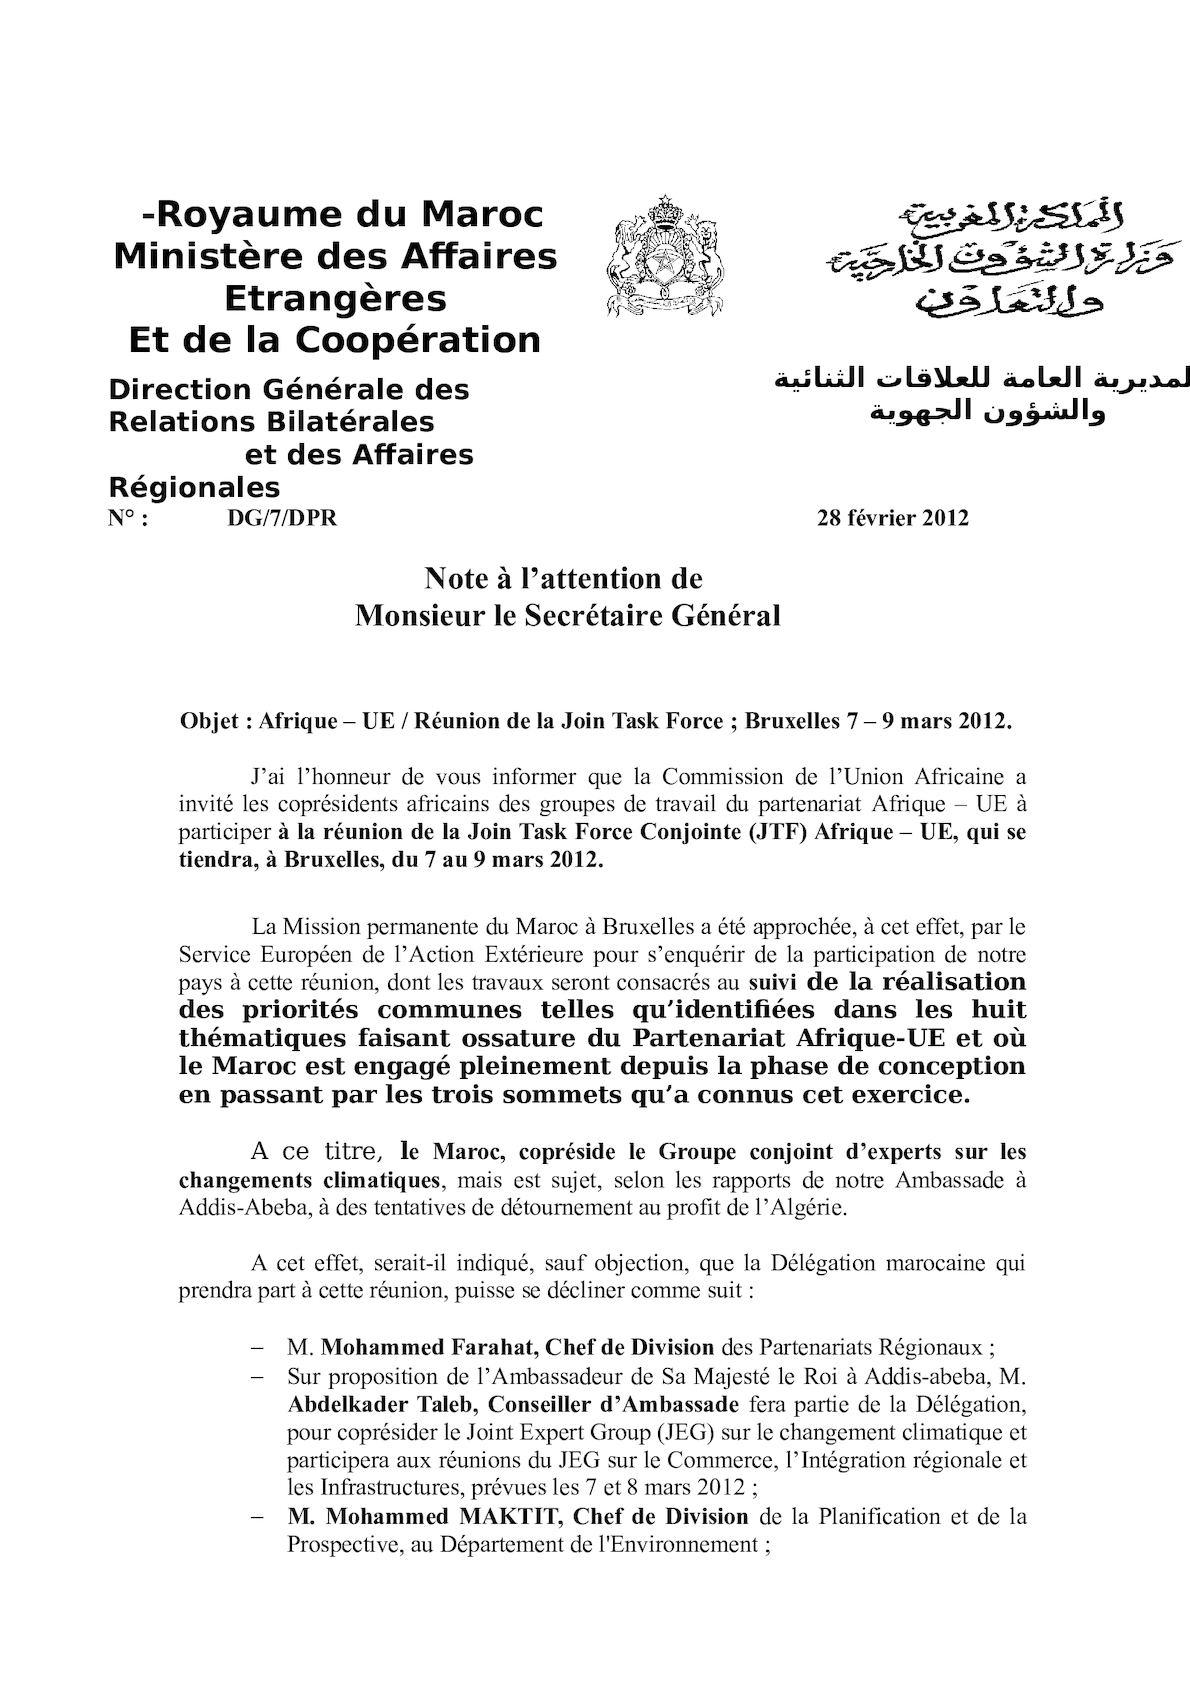 Afrique UE JEGs 7 9 Mars 2012 Note SG